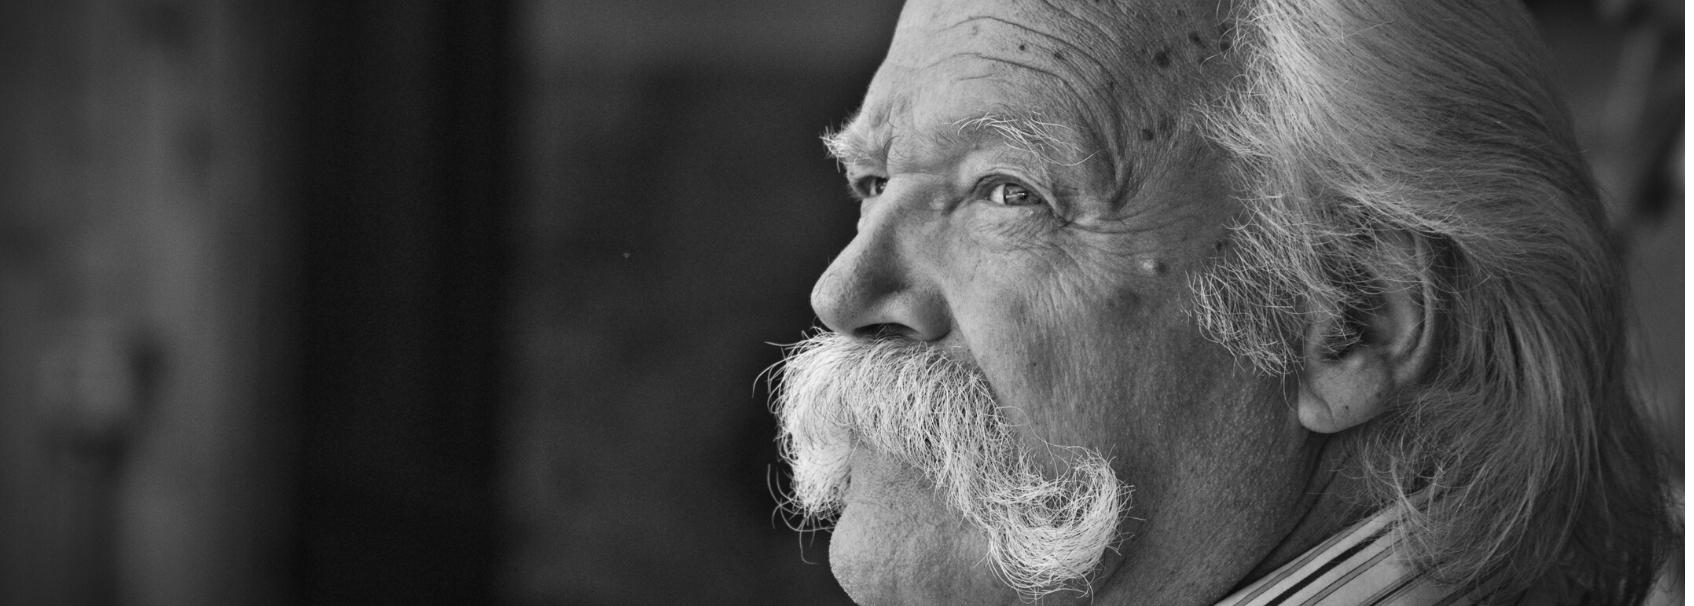 tipod de bigote